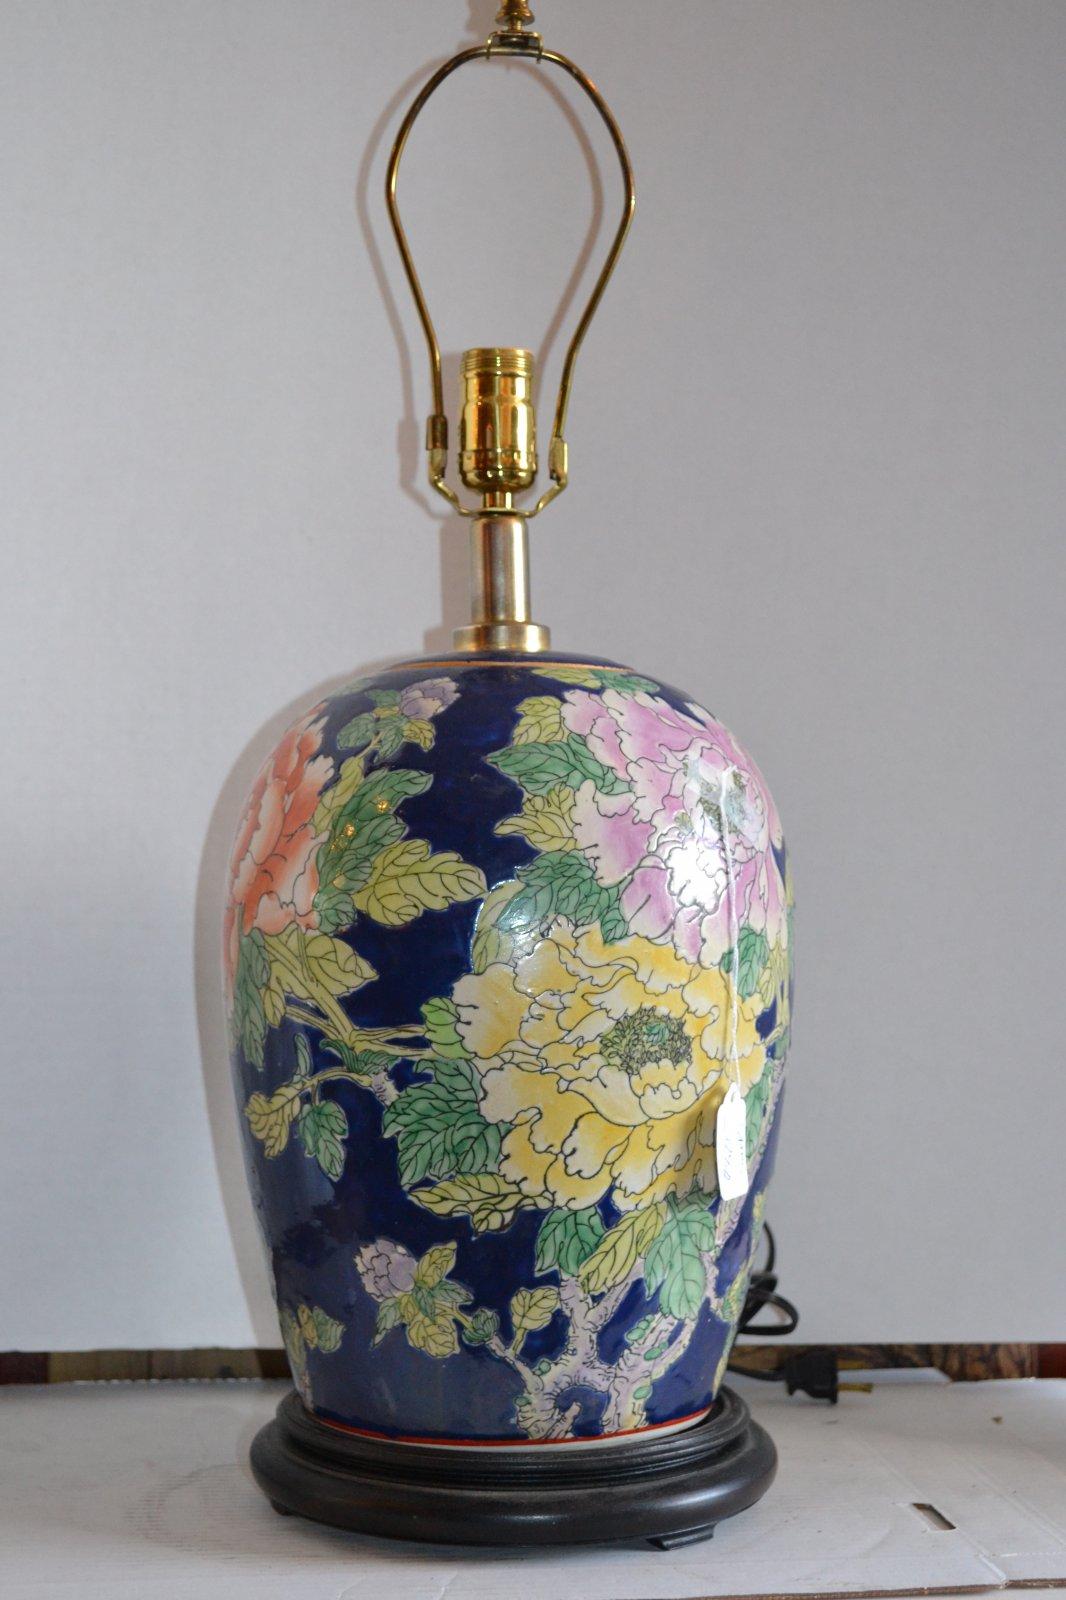 20th Century Decorative Art Handpainted Porcelain Lamp w/ wooden base, blue background, blue & orange flowers & birds H. 26 X W. 9